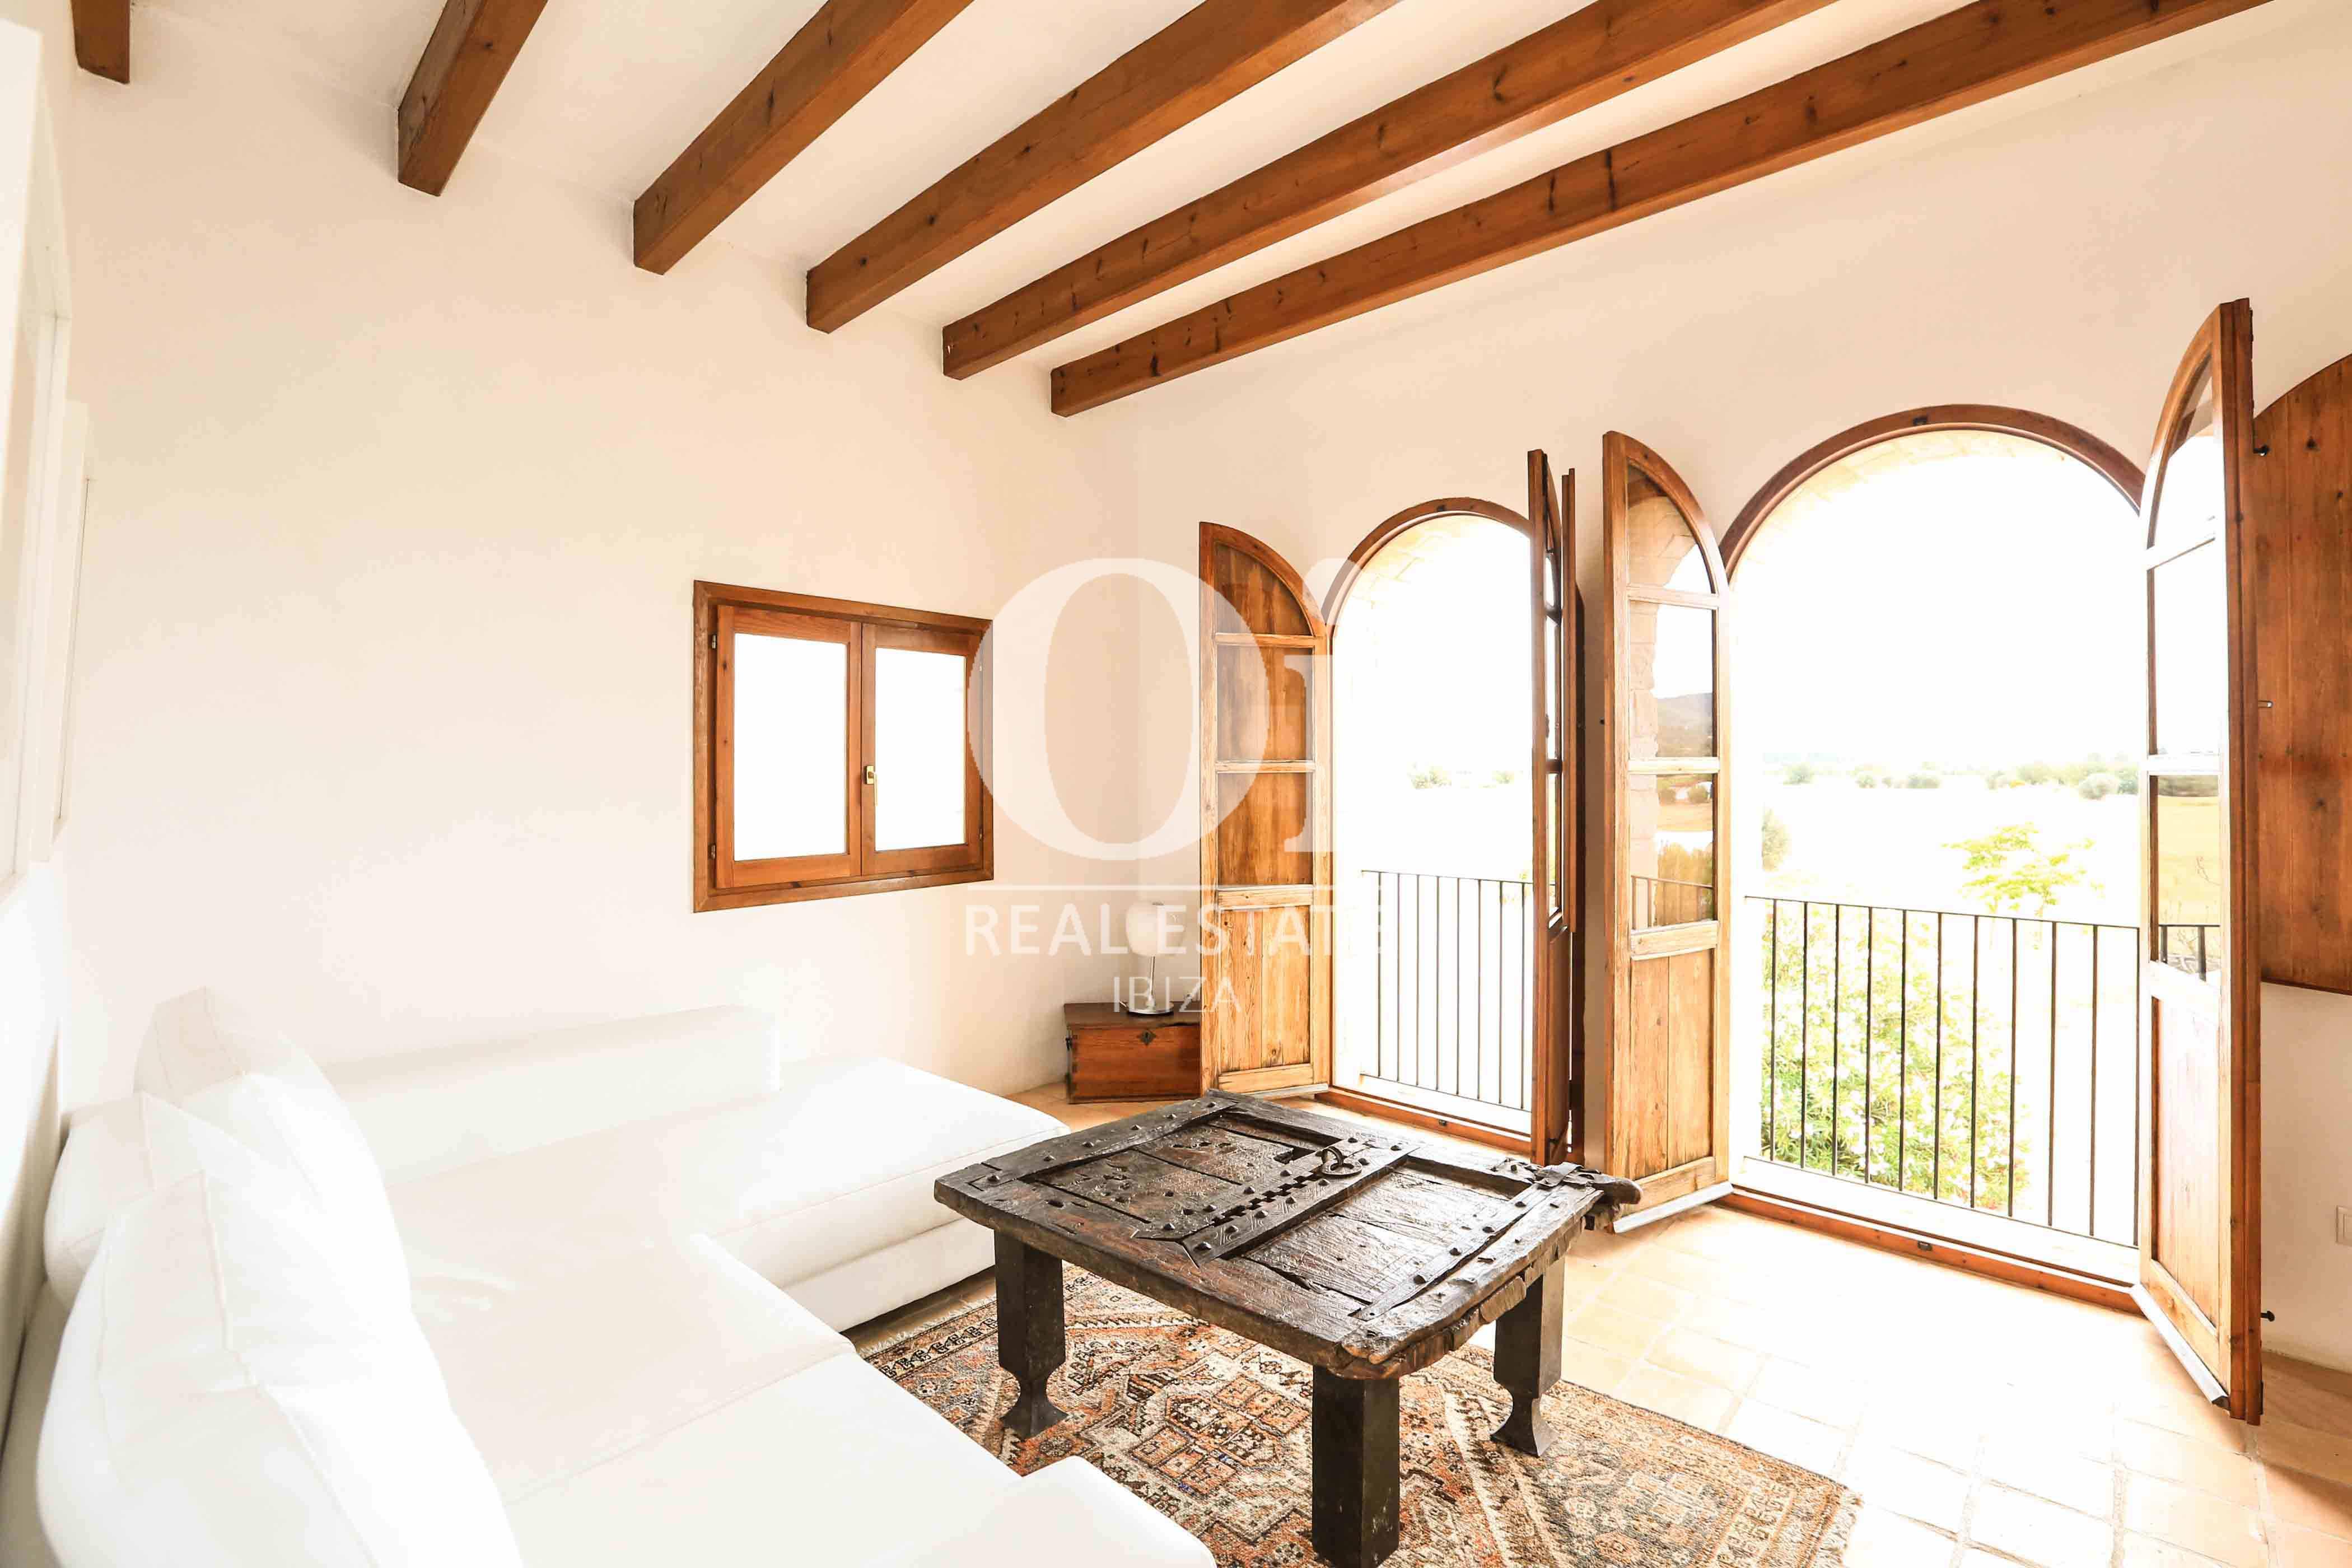 Sala de estar de casa de alquiler de estancia en zona Puig d'en Valls, Ibiza